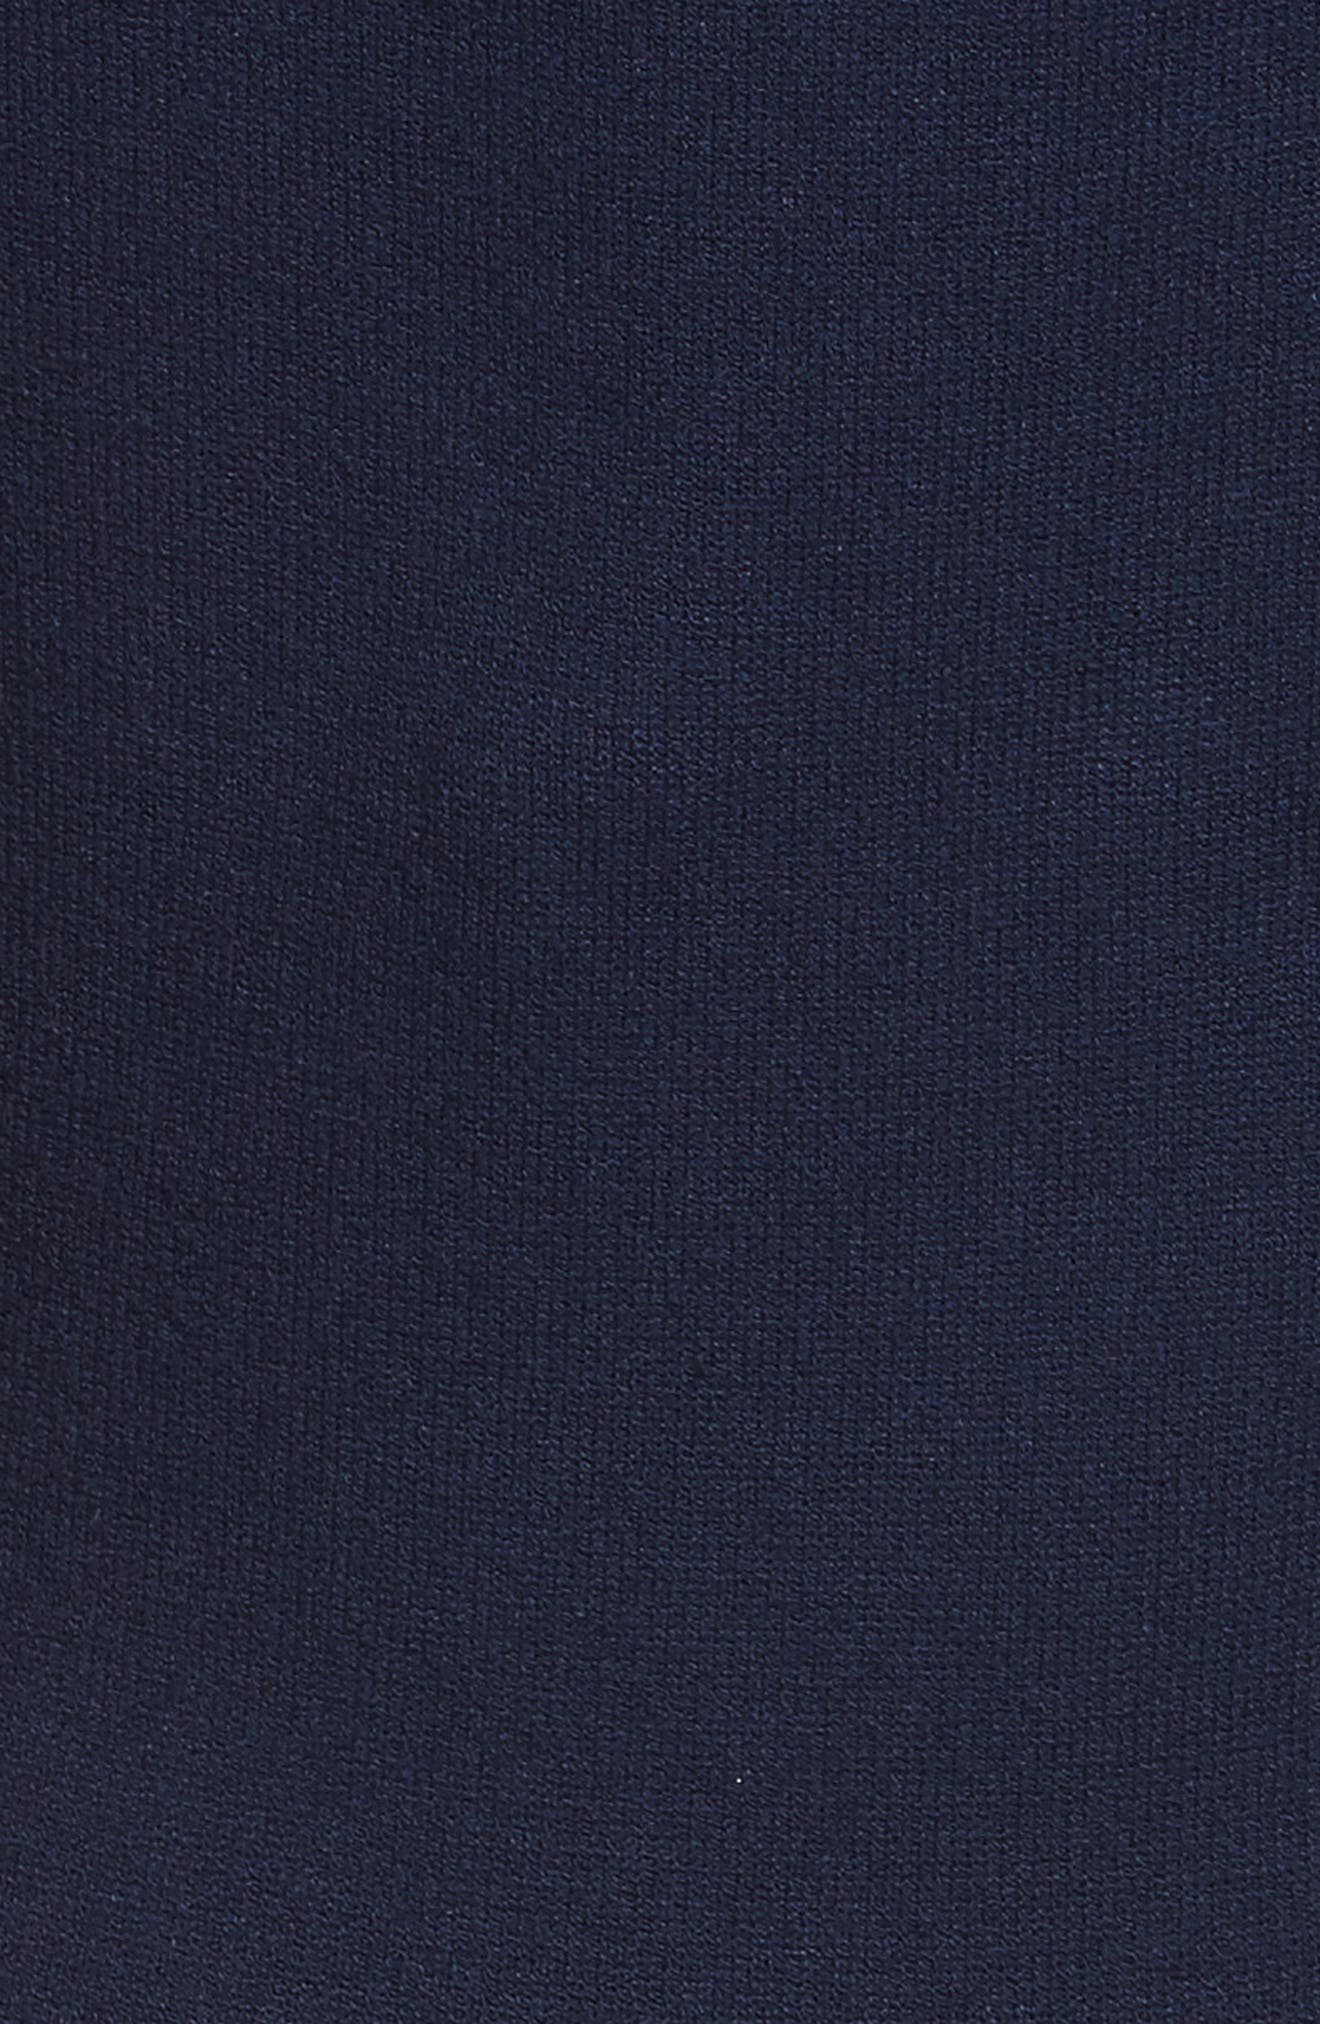 Ballet Neck Midi Dress,                             Alternate thumbnail 5, color,                             Navy